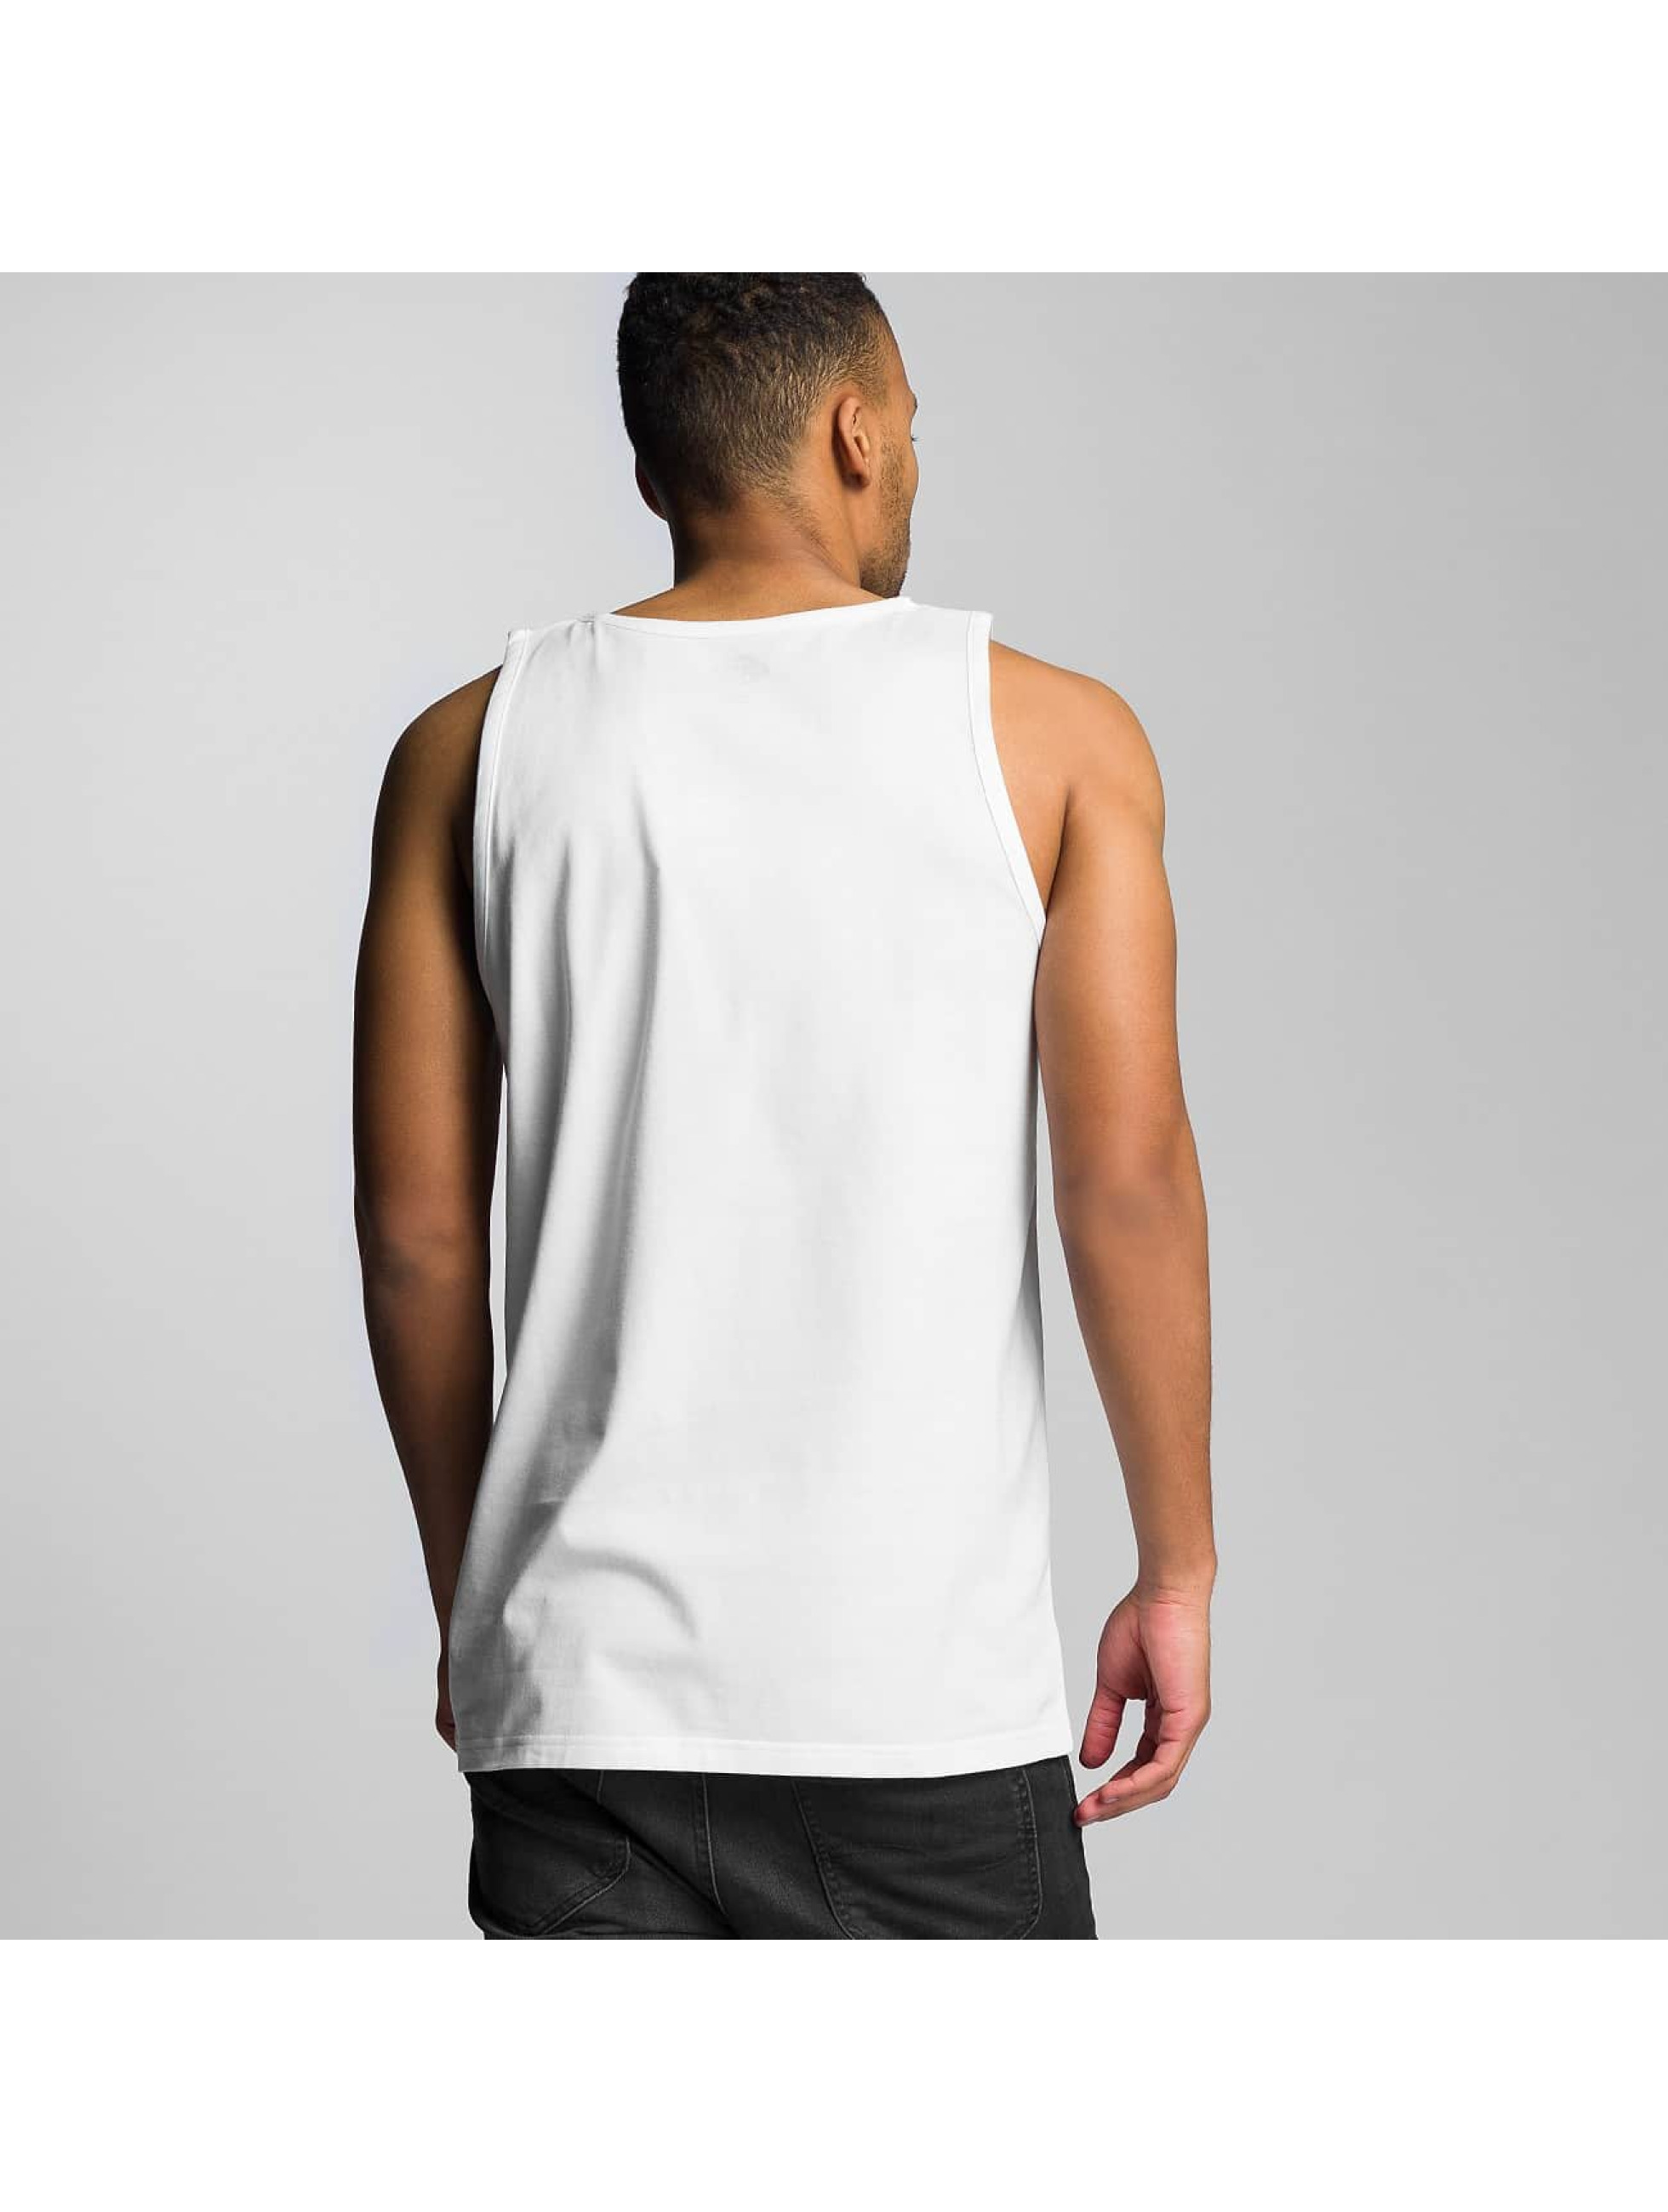 Dickies Tank Tops HS One Vest white